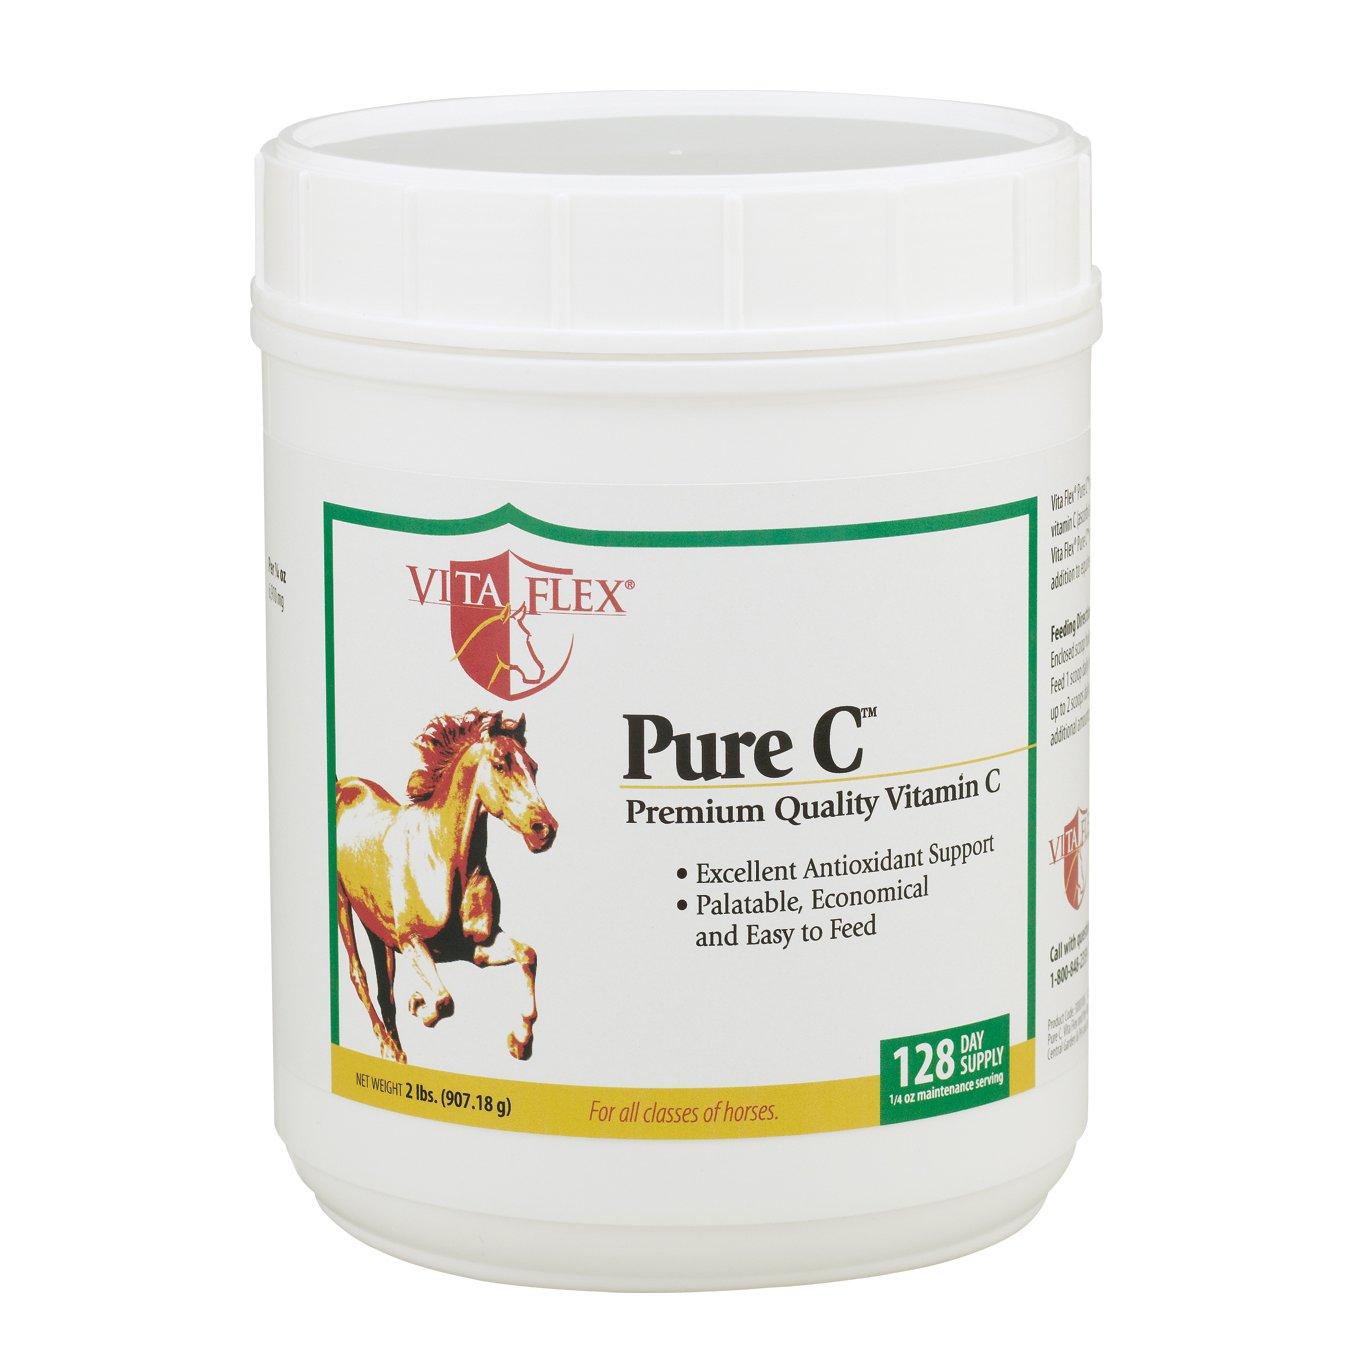 Vita Flex Pure C Premium Quality Vitamin C, 128 Day Supply, 2 Pounds